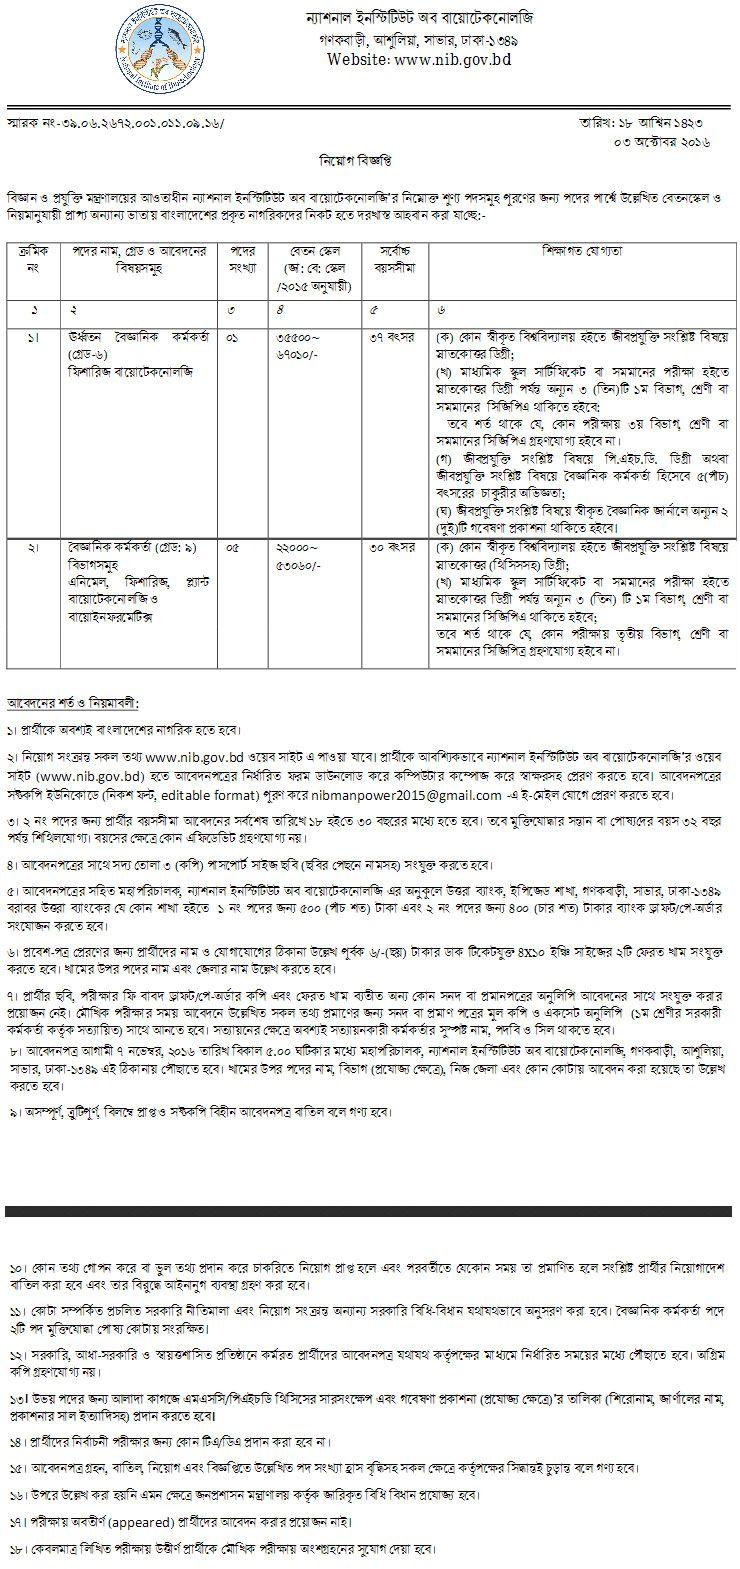 National Institute of Biotechnology Job Circular | Job